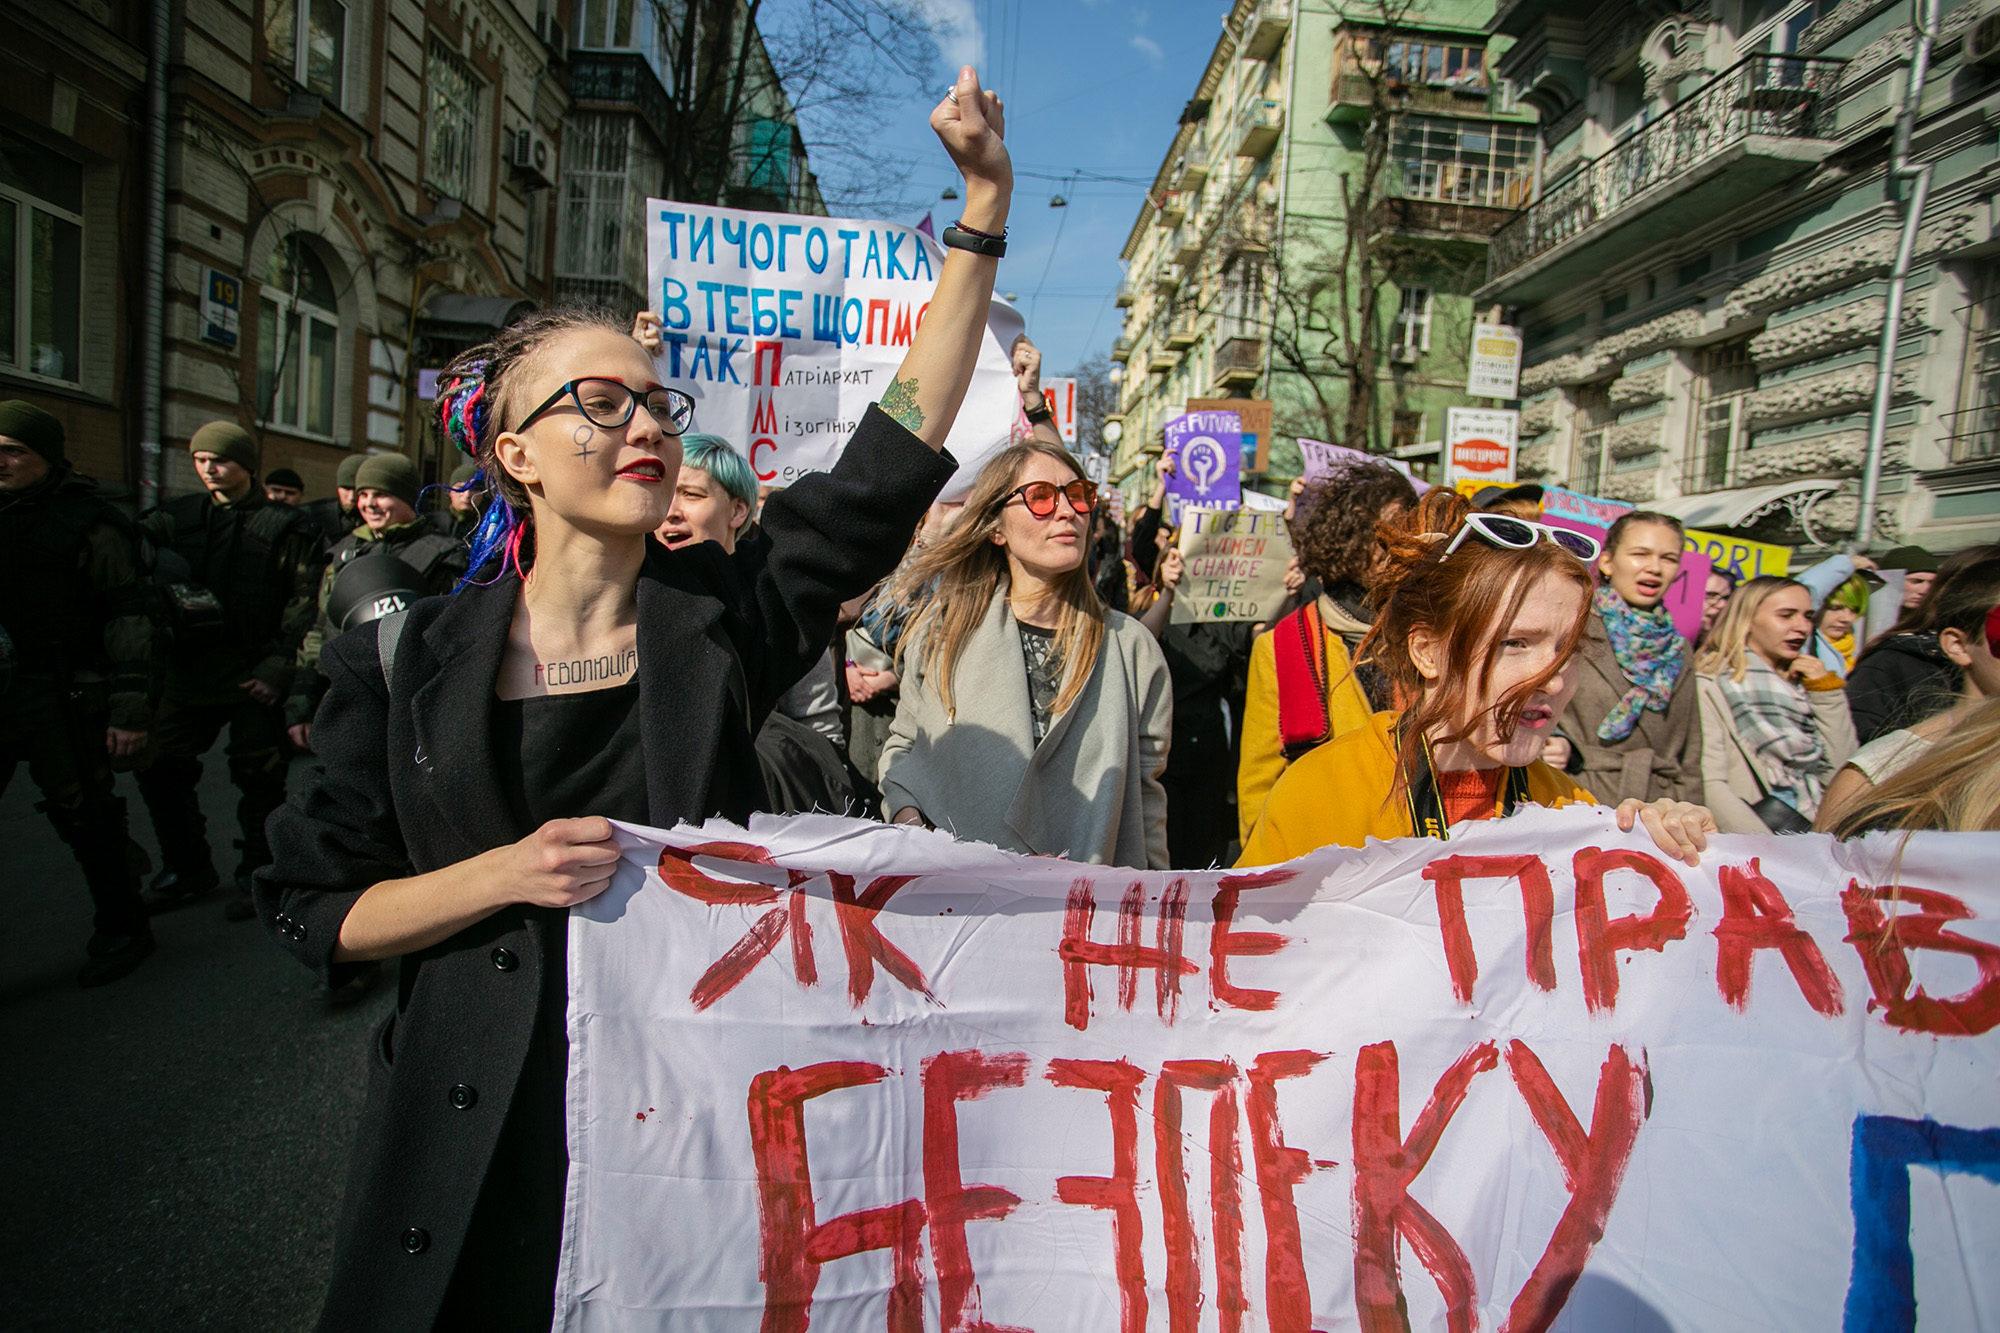 Екс-студентка стала обличчям протесту проти домагань і насильства у вишах - сексуальне насильство, насильство, кримінал - 304 nasylstvo u VUZah 2000x1333